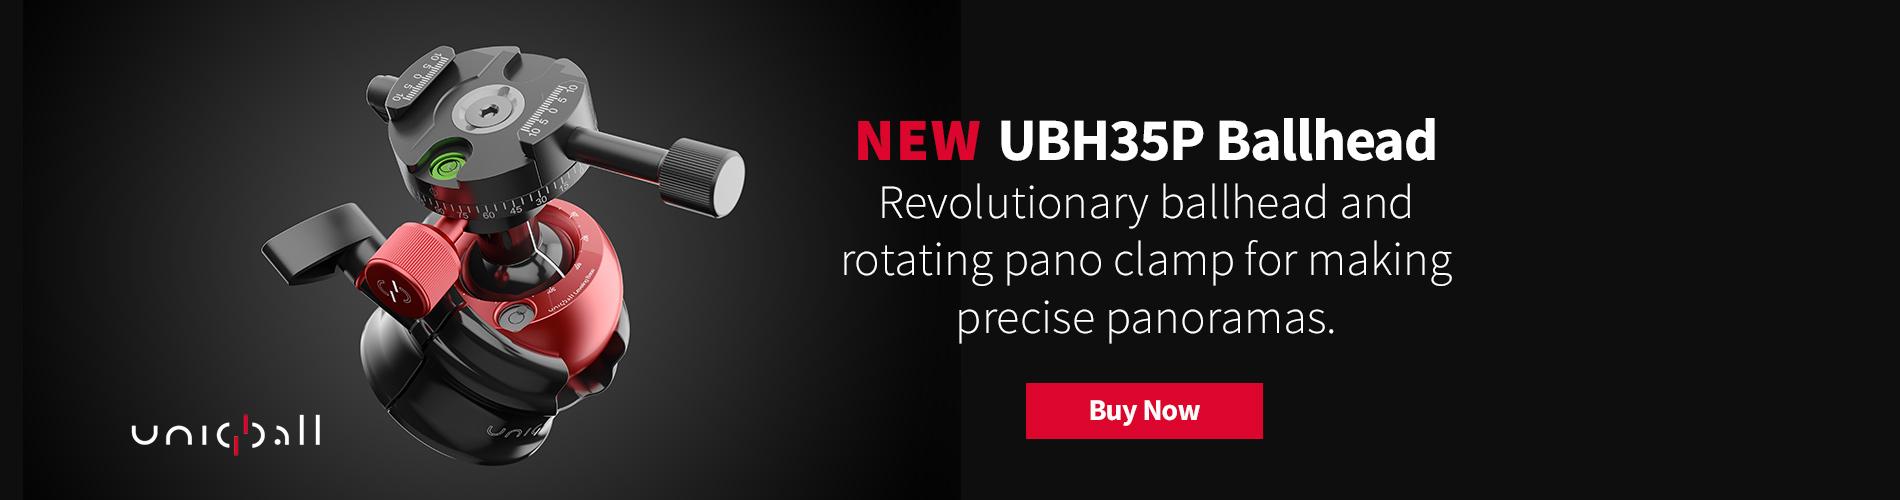 NEW UniqBall UBH35P Ballhead - Revolutionary ballhead and rotating pano clamp for making precise panoramas.